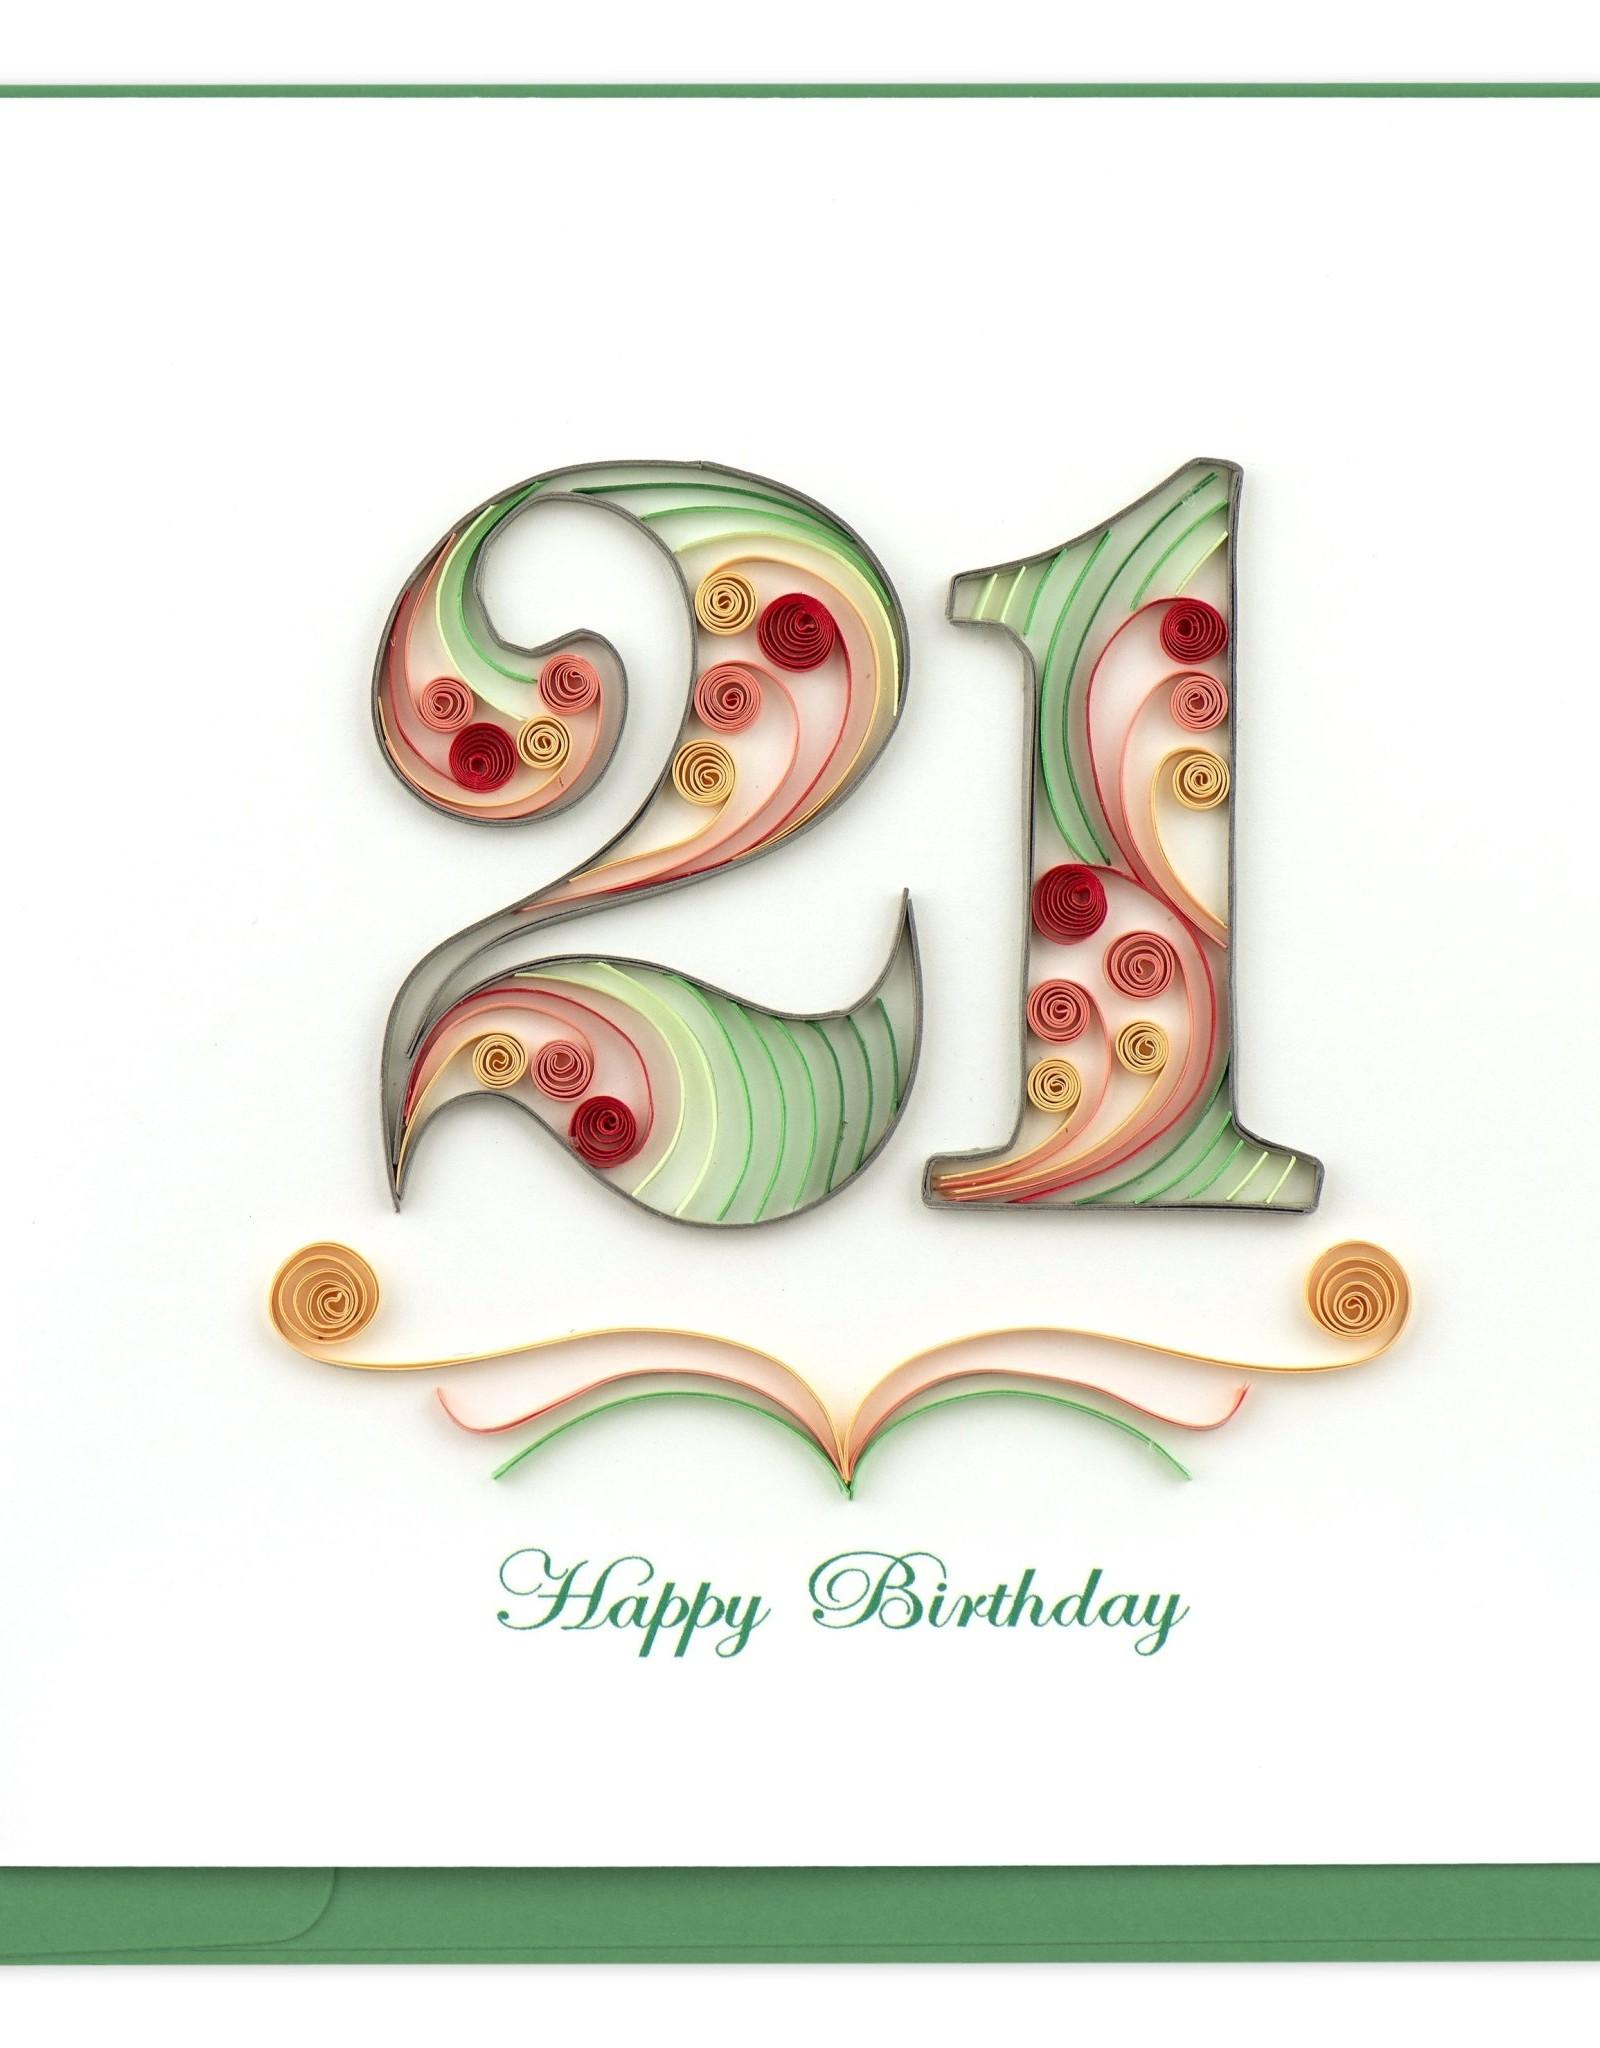 21st Birthday Quill Card